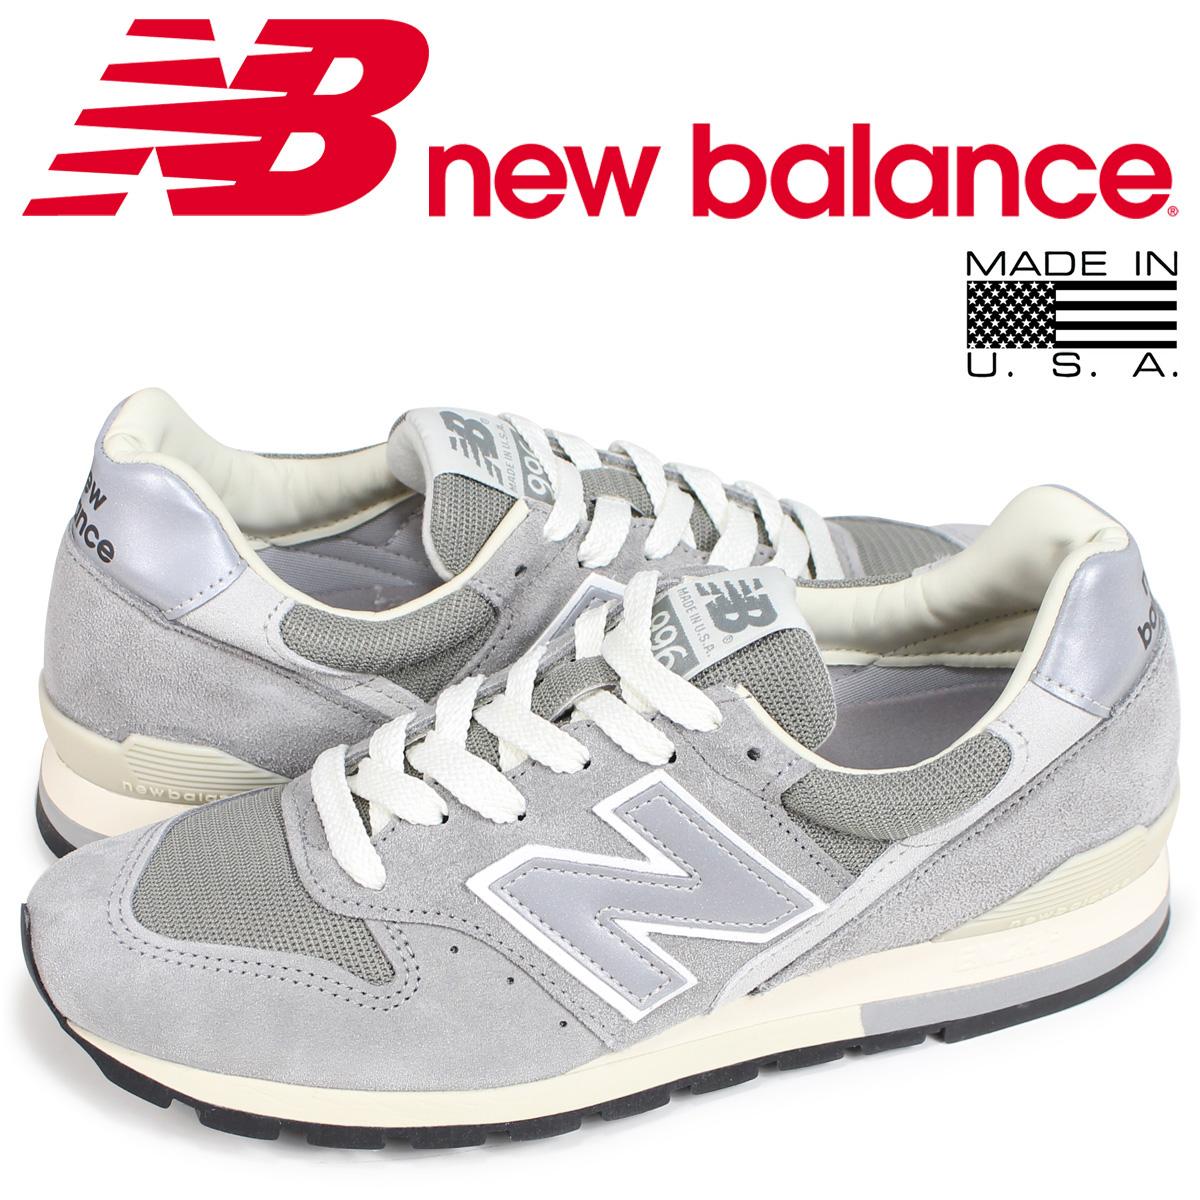 c85030a67fa77 ... new balance (ニューバランス) · カテゴリトップ > メンズ アイテム カテゴリー > シューズ > スニーカー